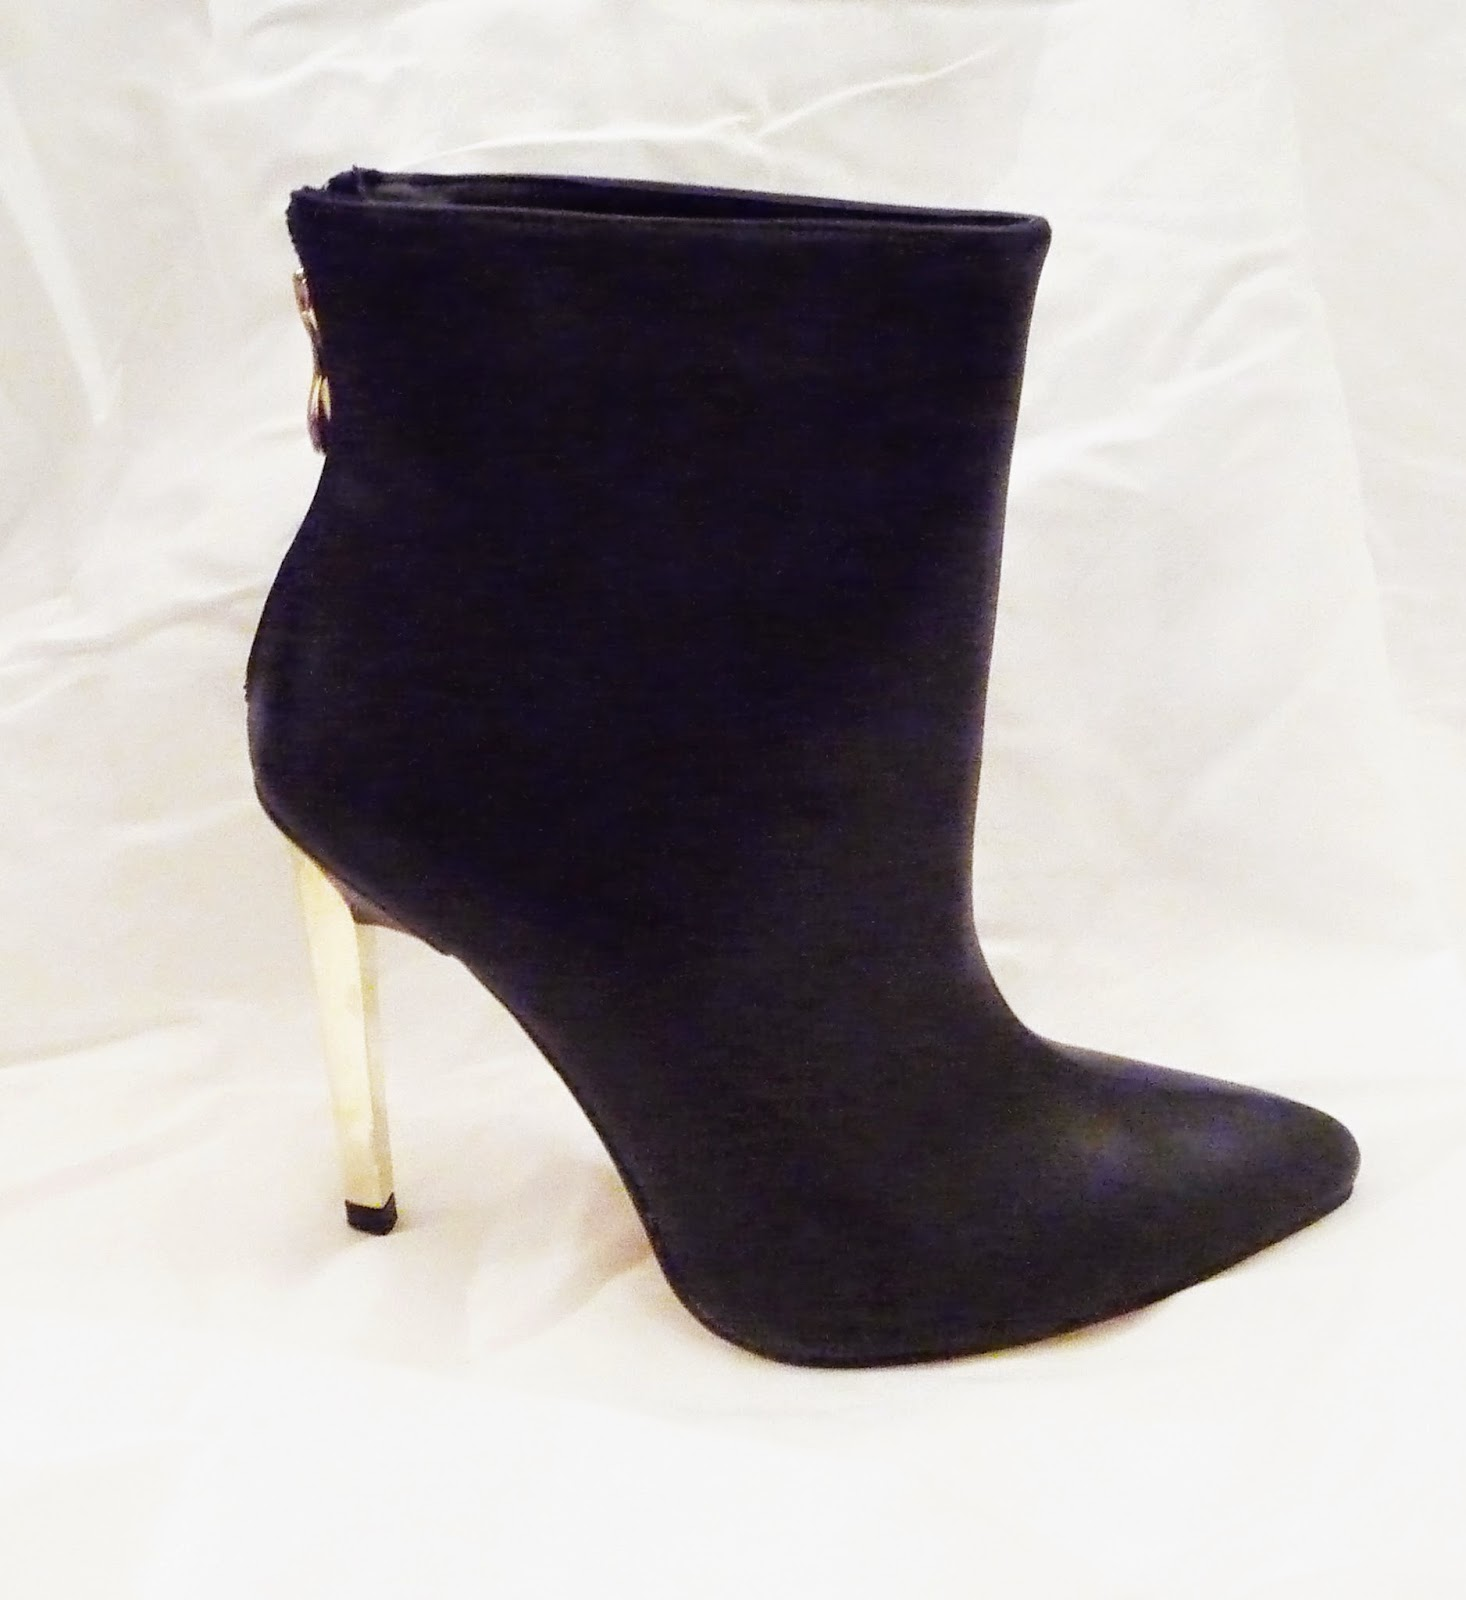 http://www.ebay.fr/itm/bottines-noires-femme-sexy-talon-dore-noir-37-38-39-40-pointues-tres-elegante-/301035209938?ssPageName=STRK:MESE:IT